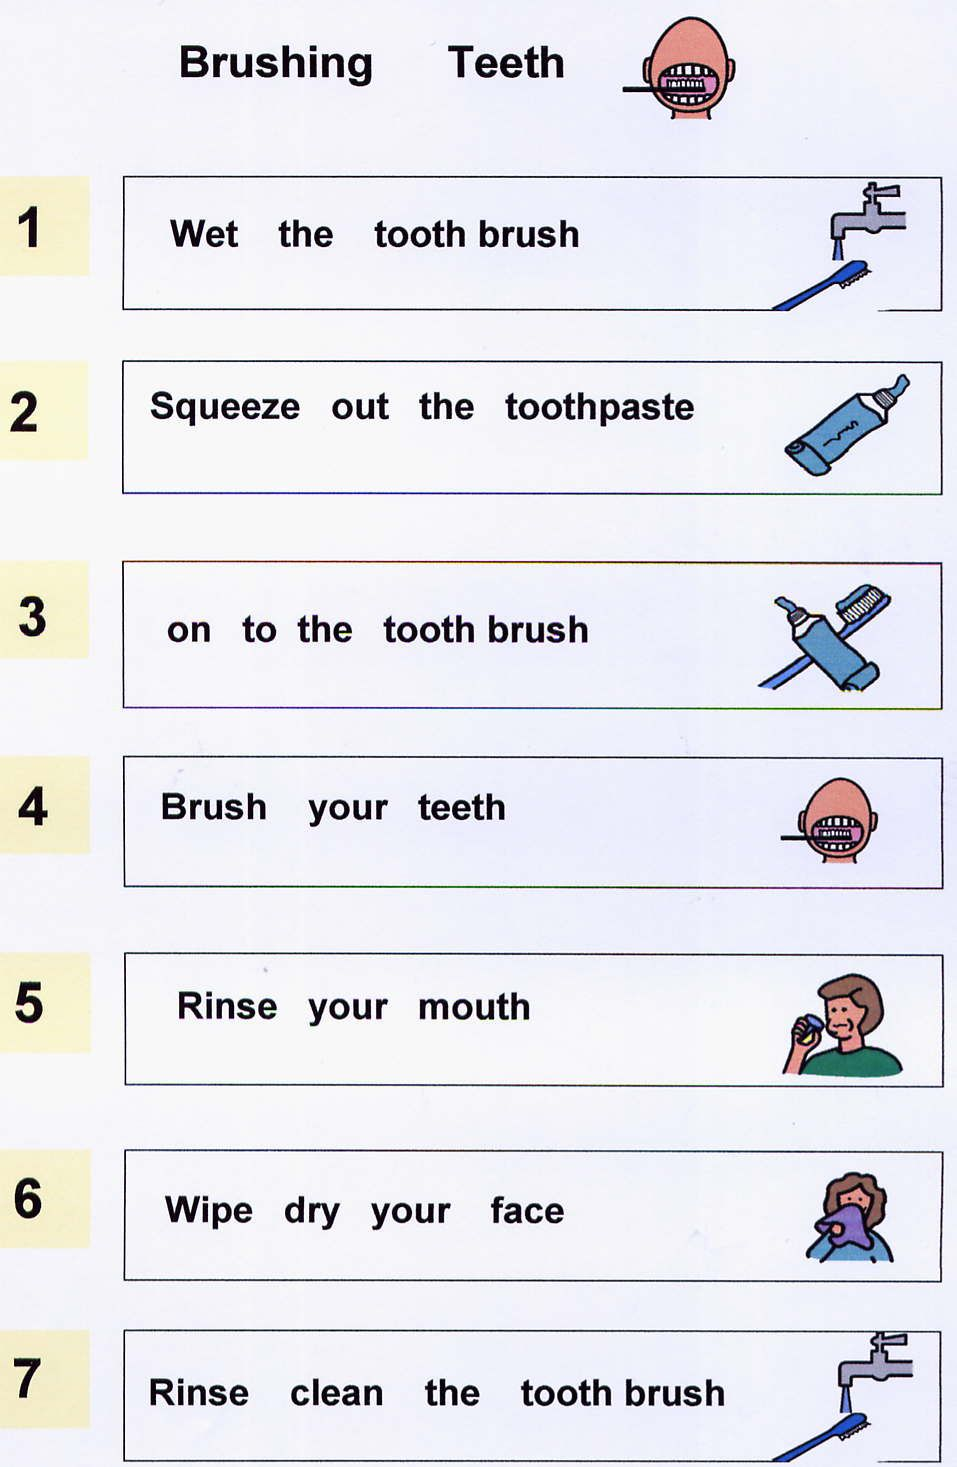 How To Brush Your Teeth Worksheet - Nidecmege [ 1467 x 957 Pixel ]